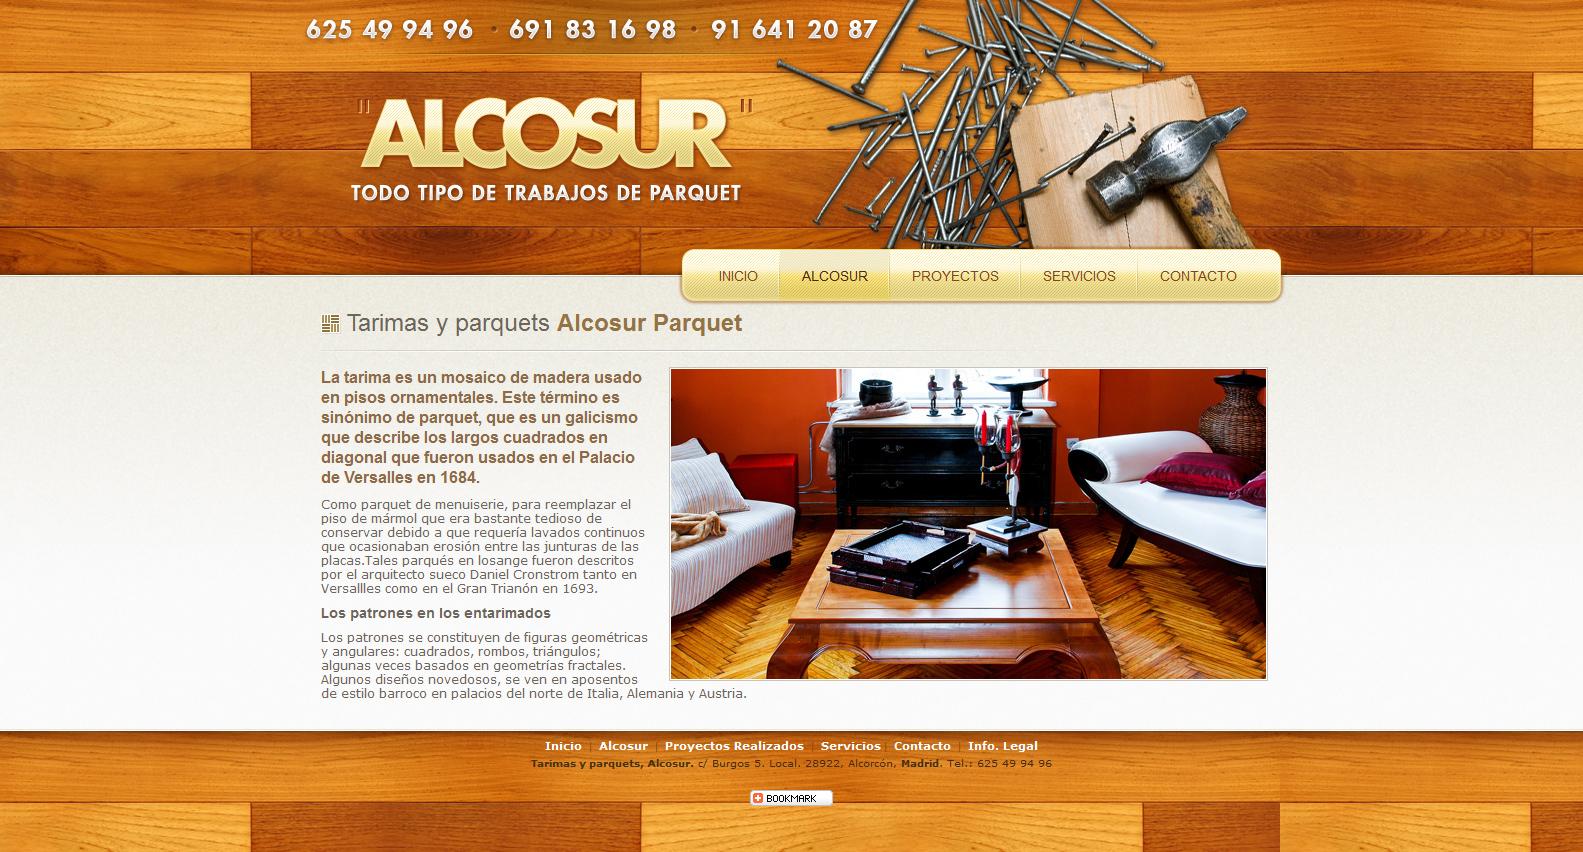 Alcosur